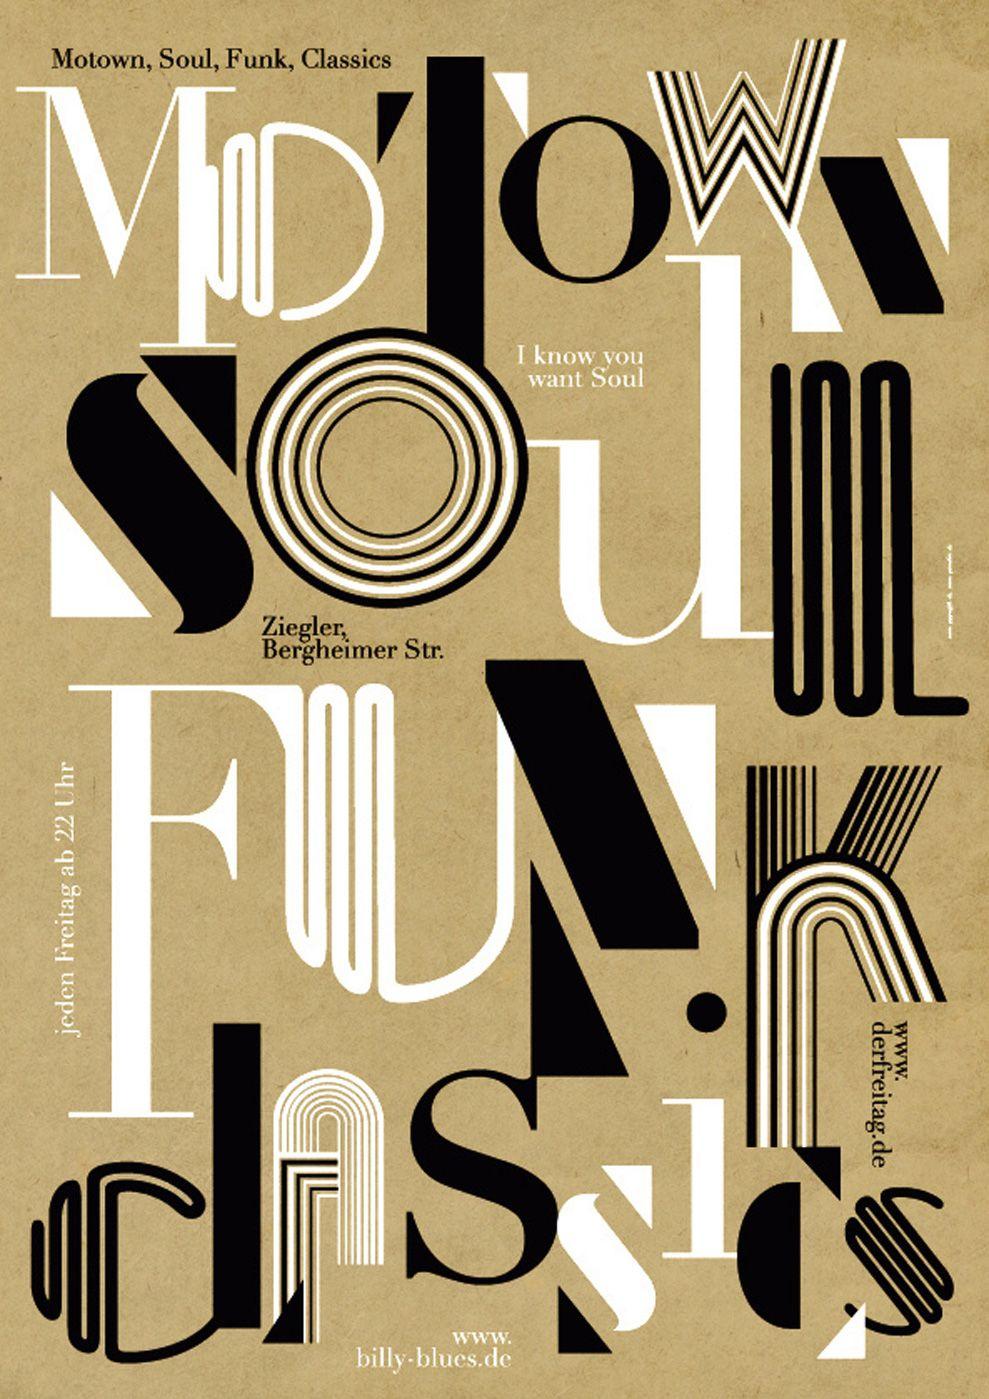 götz gramlich - typo/graphic posters | Diseño tipografico ...